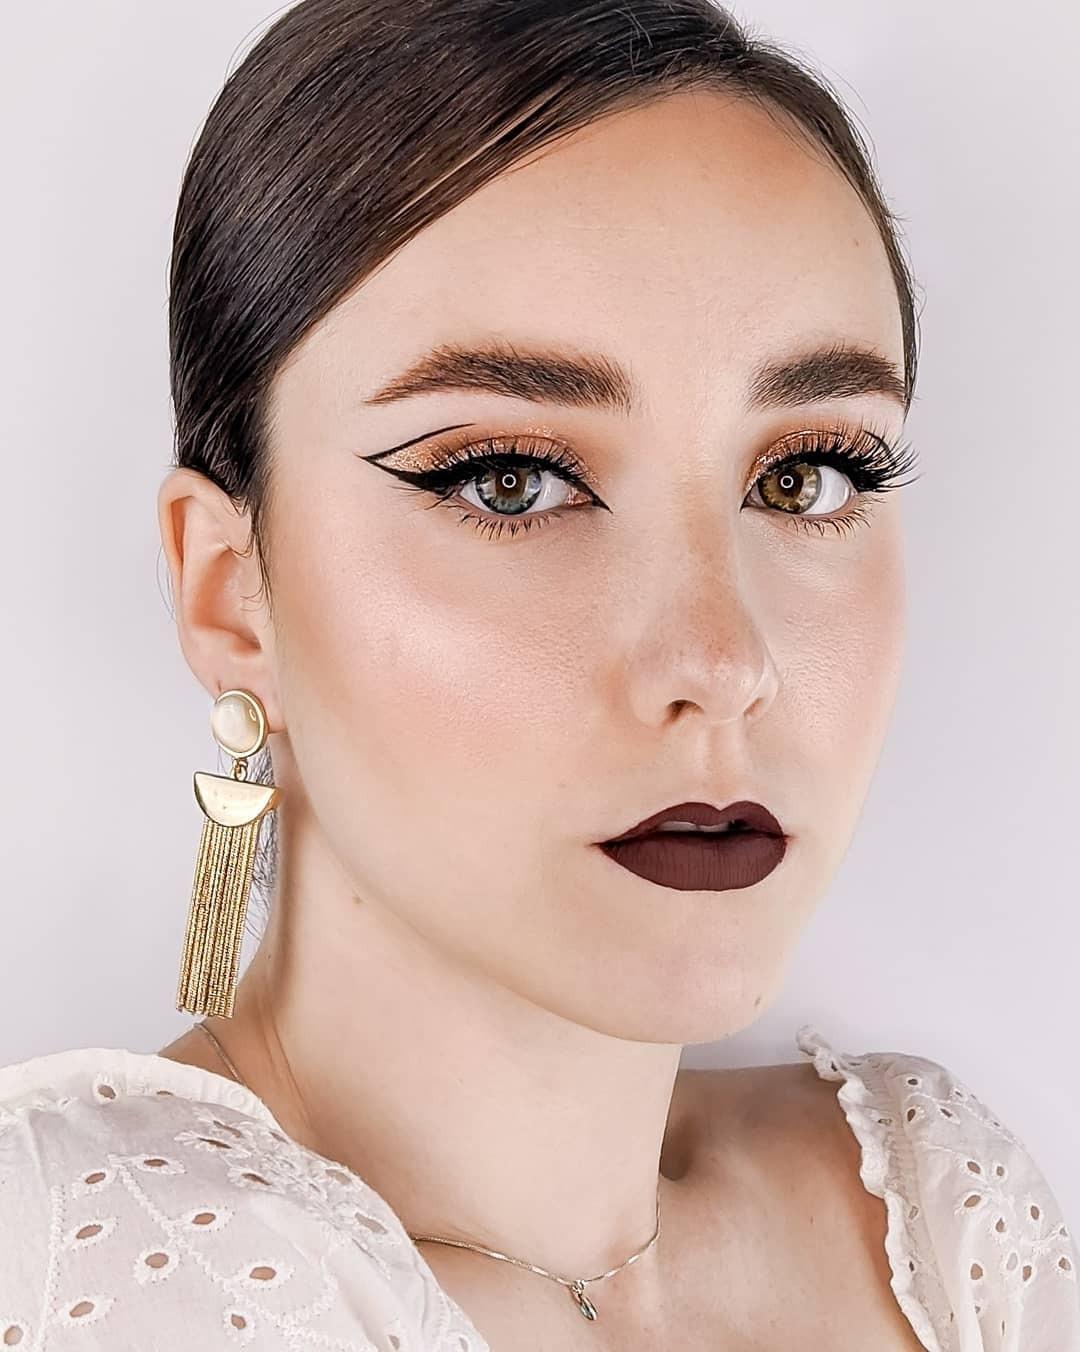 ❤️❤️Love her eyeliner so much!!! Do u like it?  ❤️❤️   Pic by  @carmenportillomuaon IG #ttdeye#ttd_eye#ttdeyeofficial#beautylover#eyelashes#graphiceyeliner#cosmetics#fashion#eyebrow#contactlenses#softlenses#circlelenses#earrings